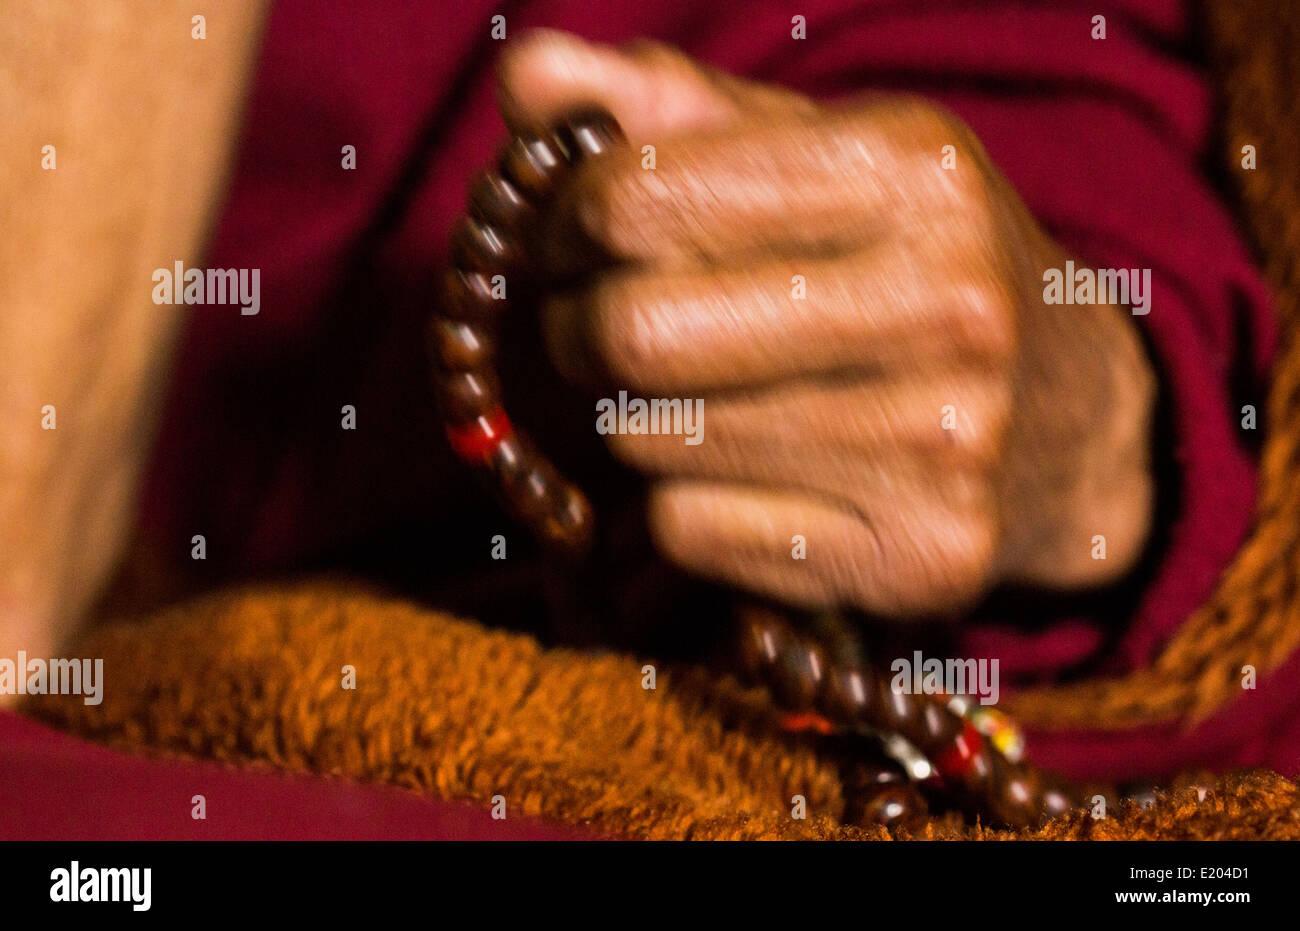 Nepal Himalayas Buddhist nun with prayer beads at the Kharigandentenphelling Monastery in the village of Thamo Solukhumbu - Stock Image